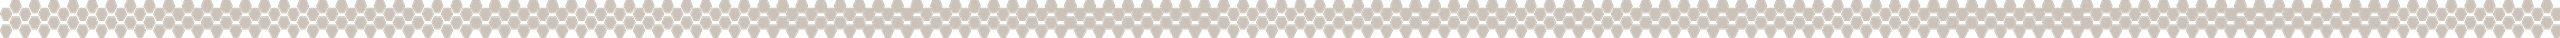 Hexagon Seperator